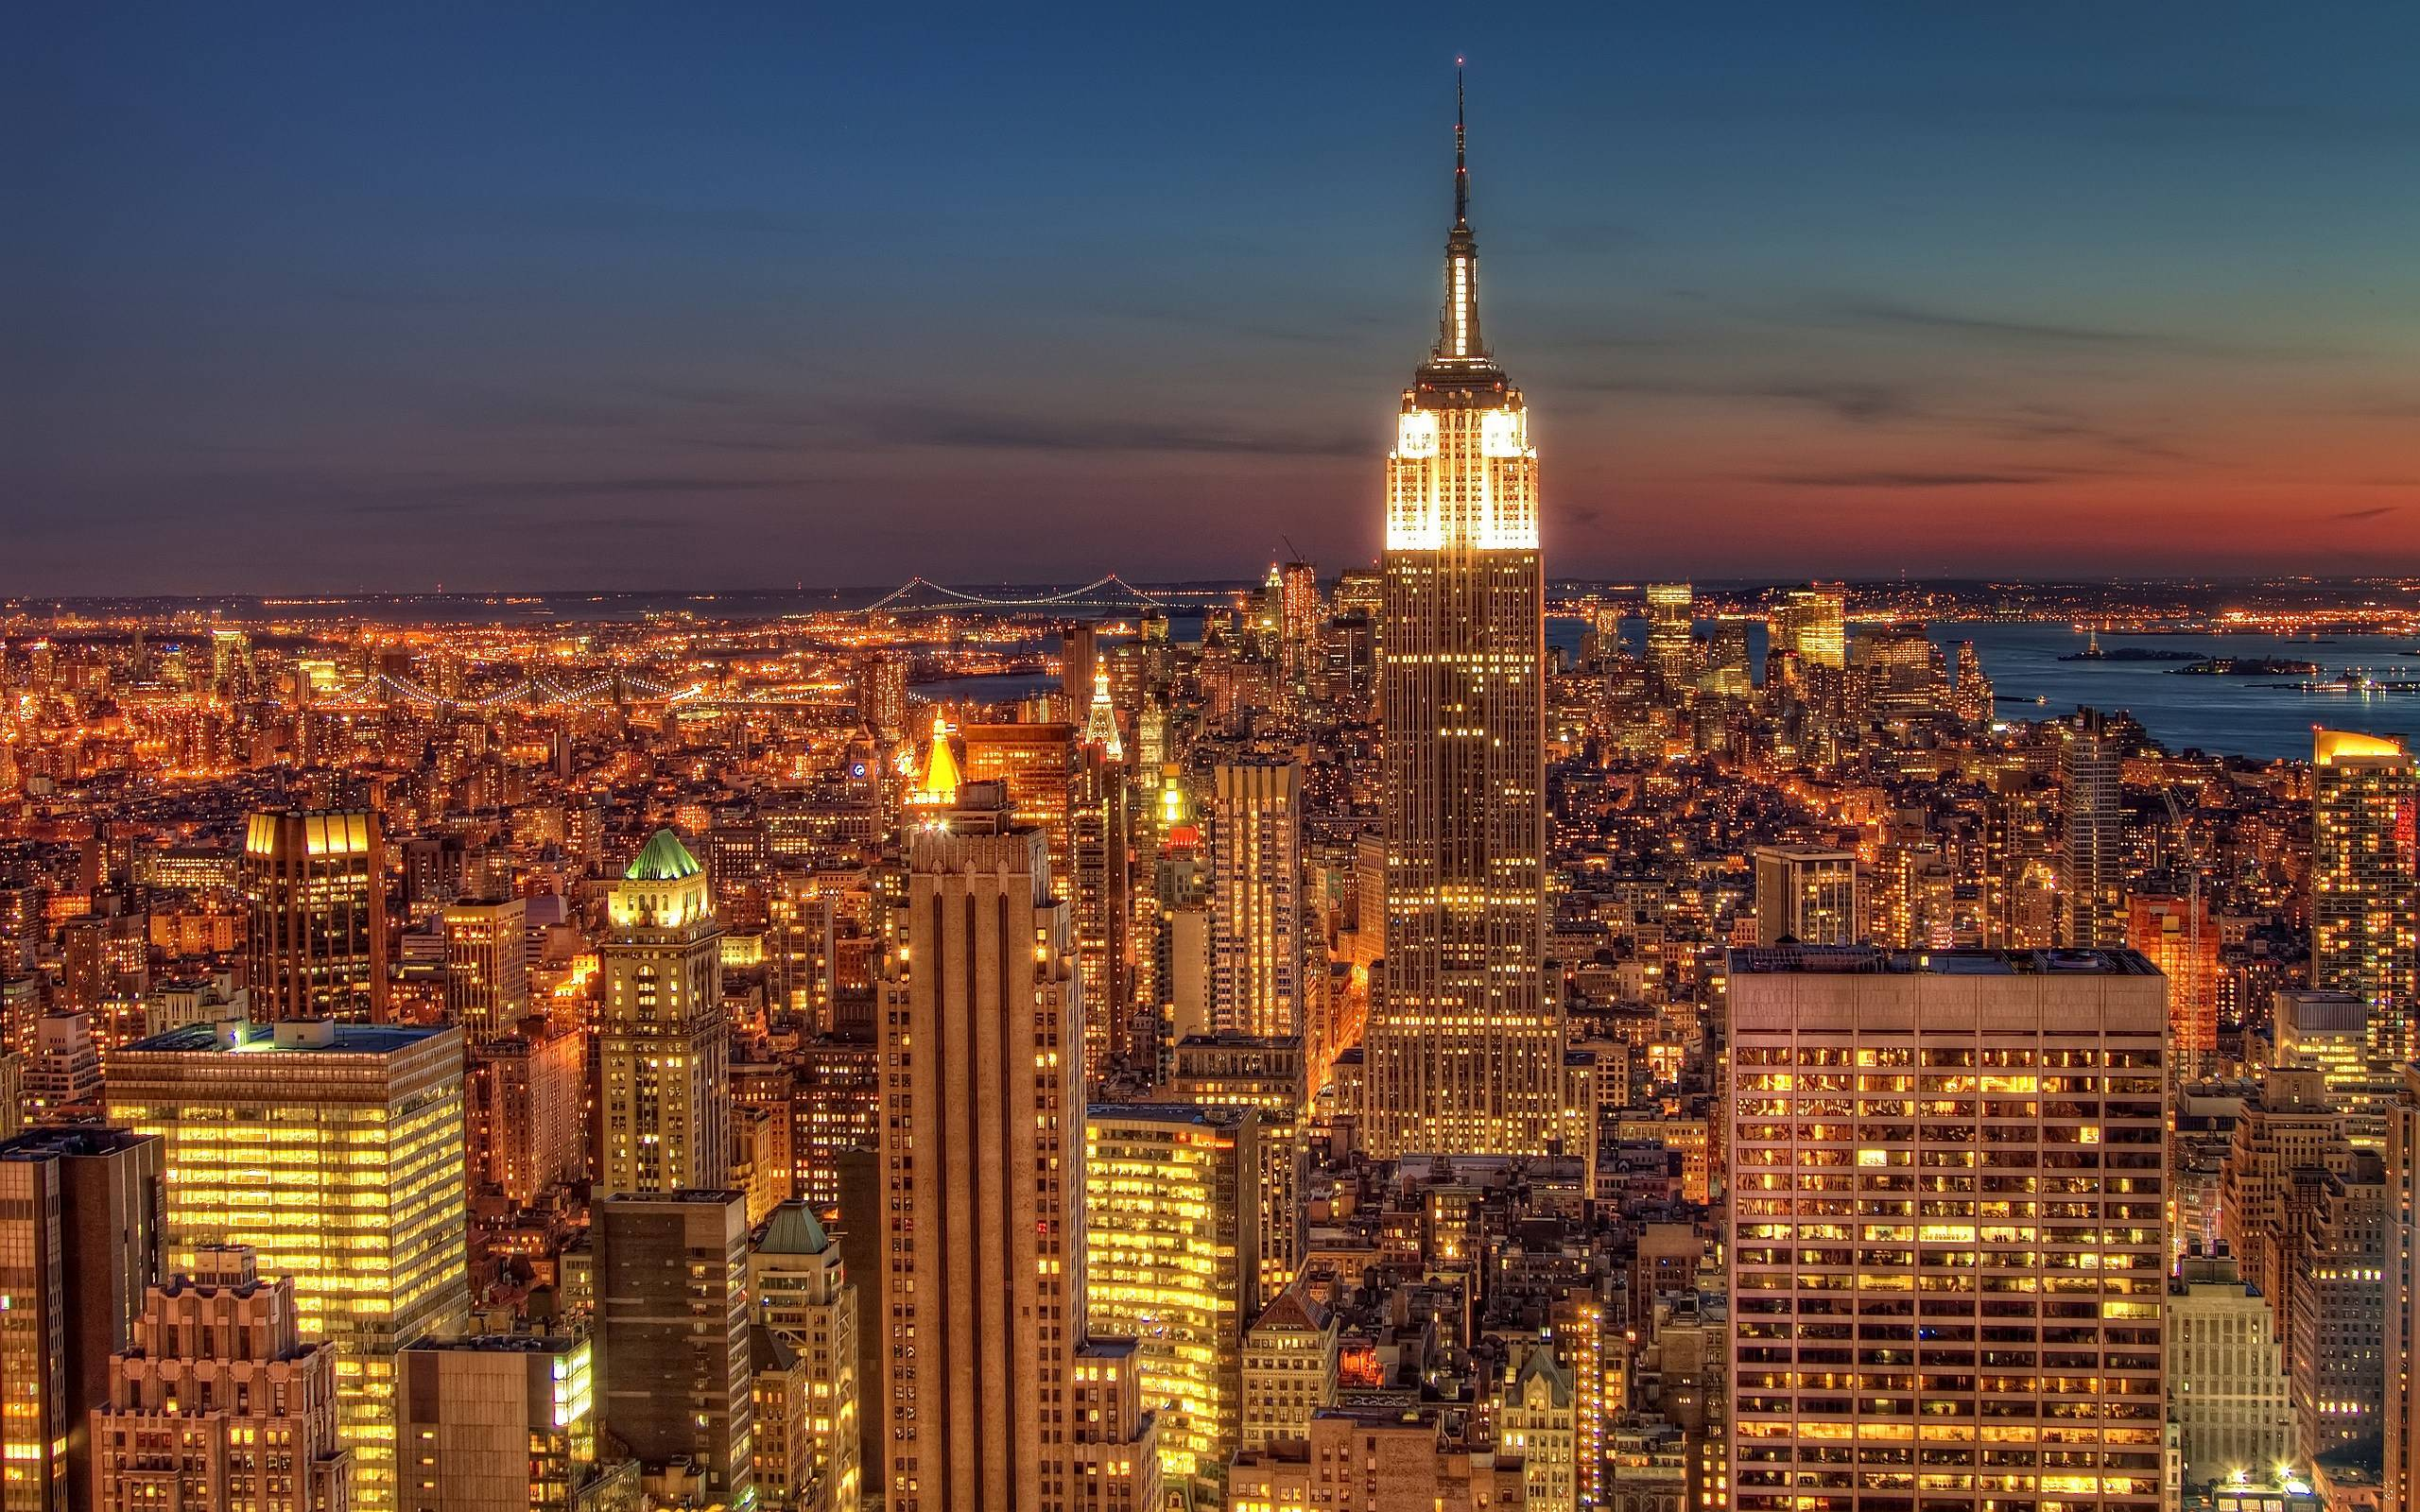 New York City Night Wallpapers Top Free New York City Night